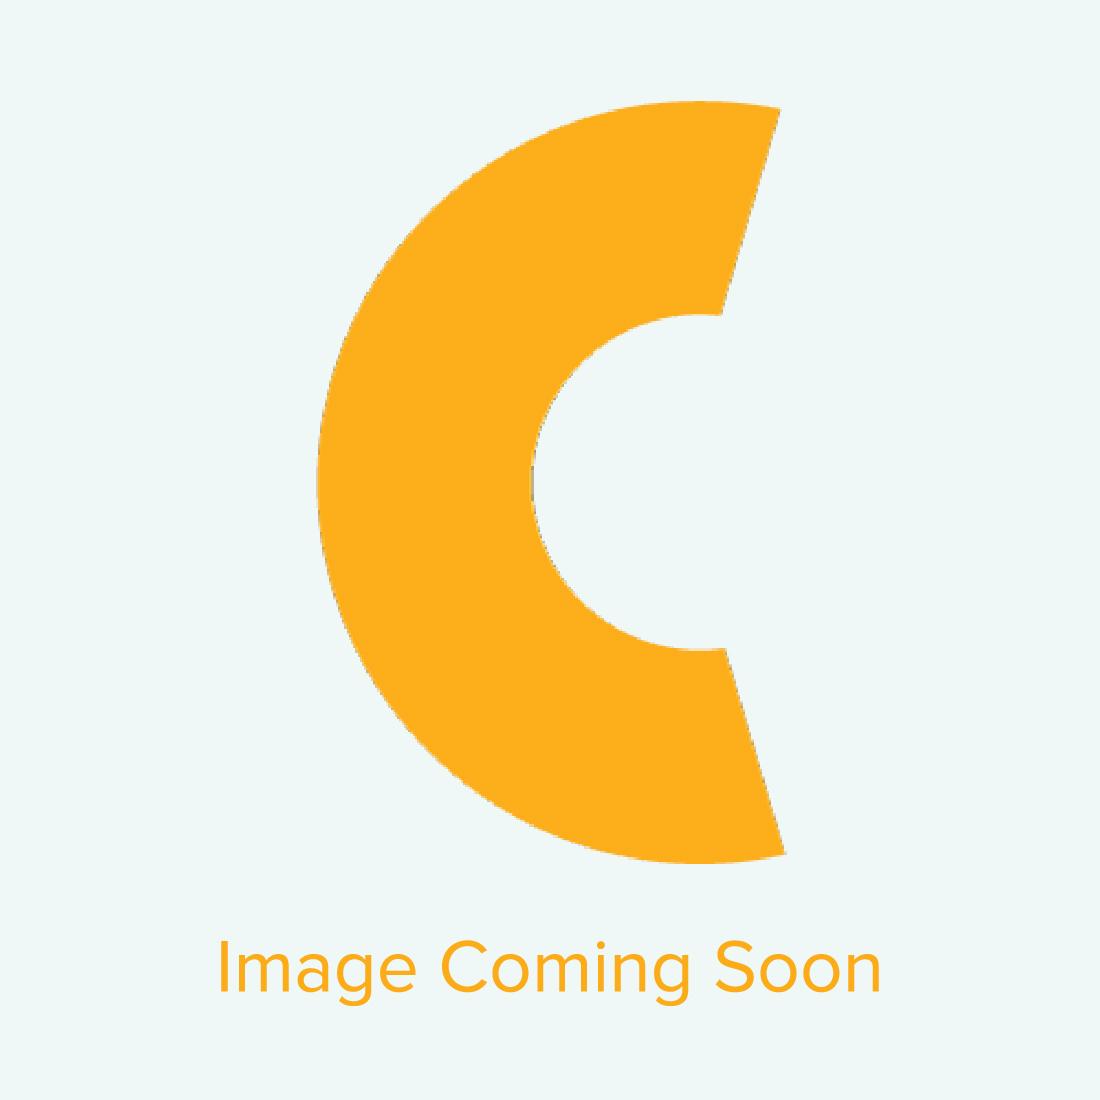 Media Catch Basket for Graphtec CE6000-60PLUS Cutter